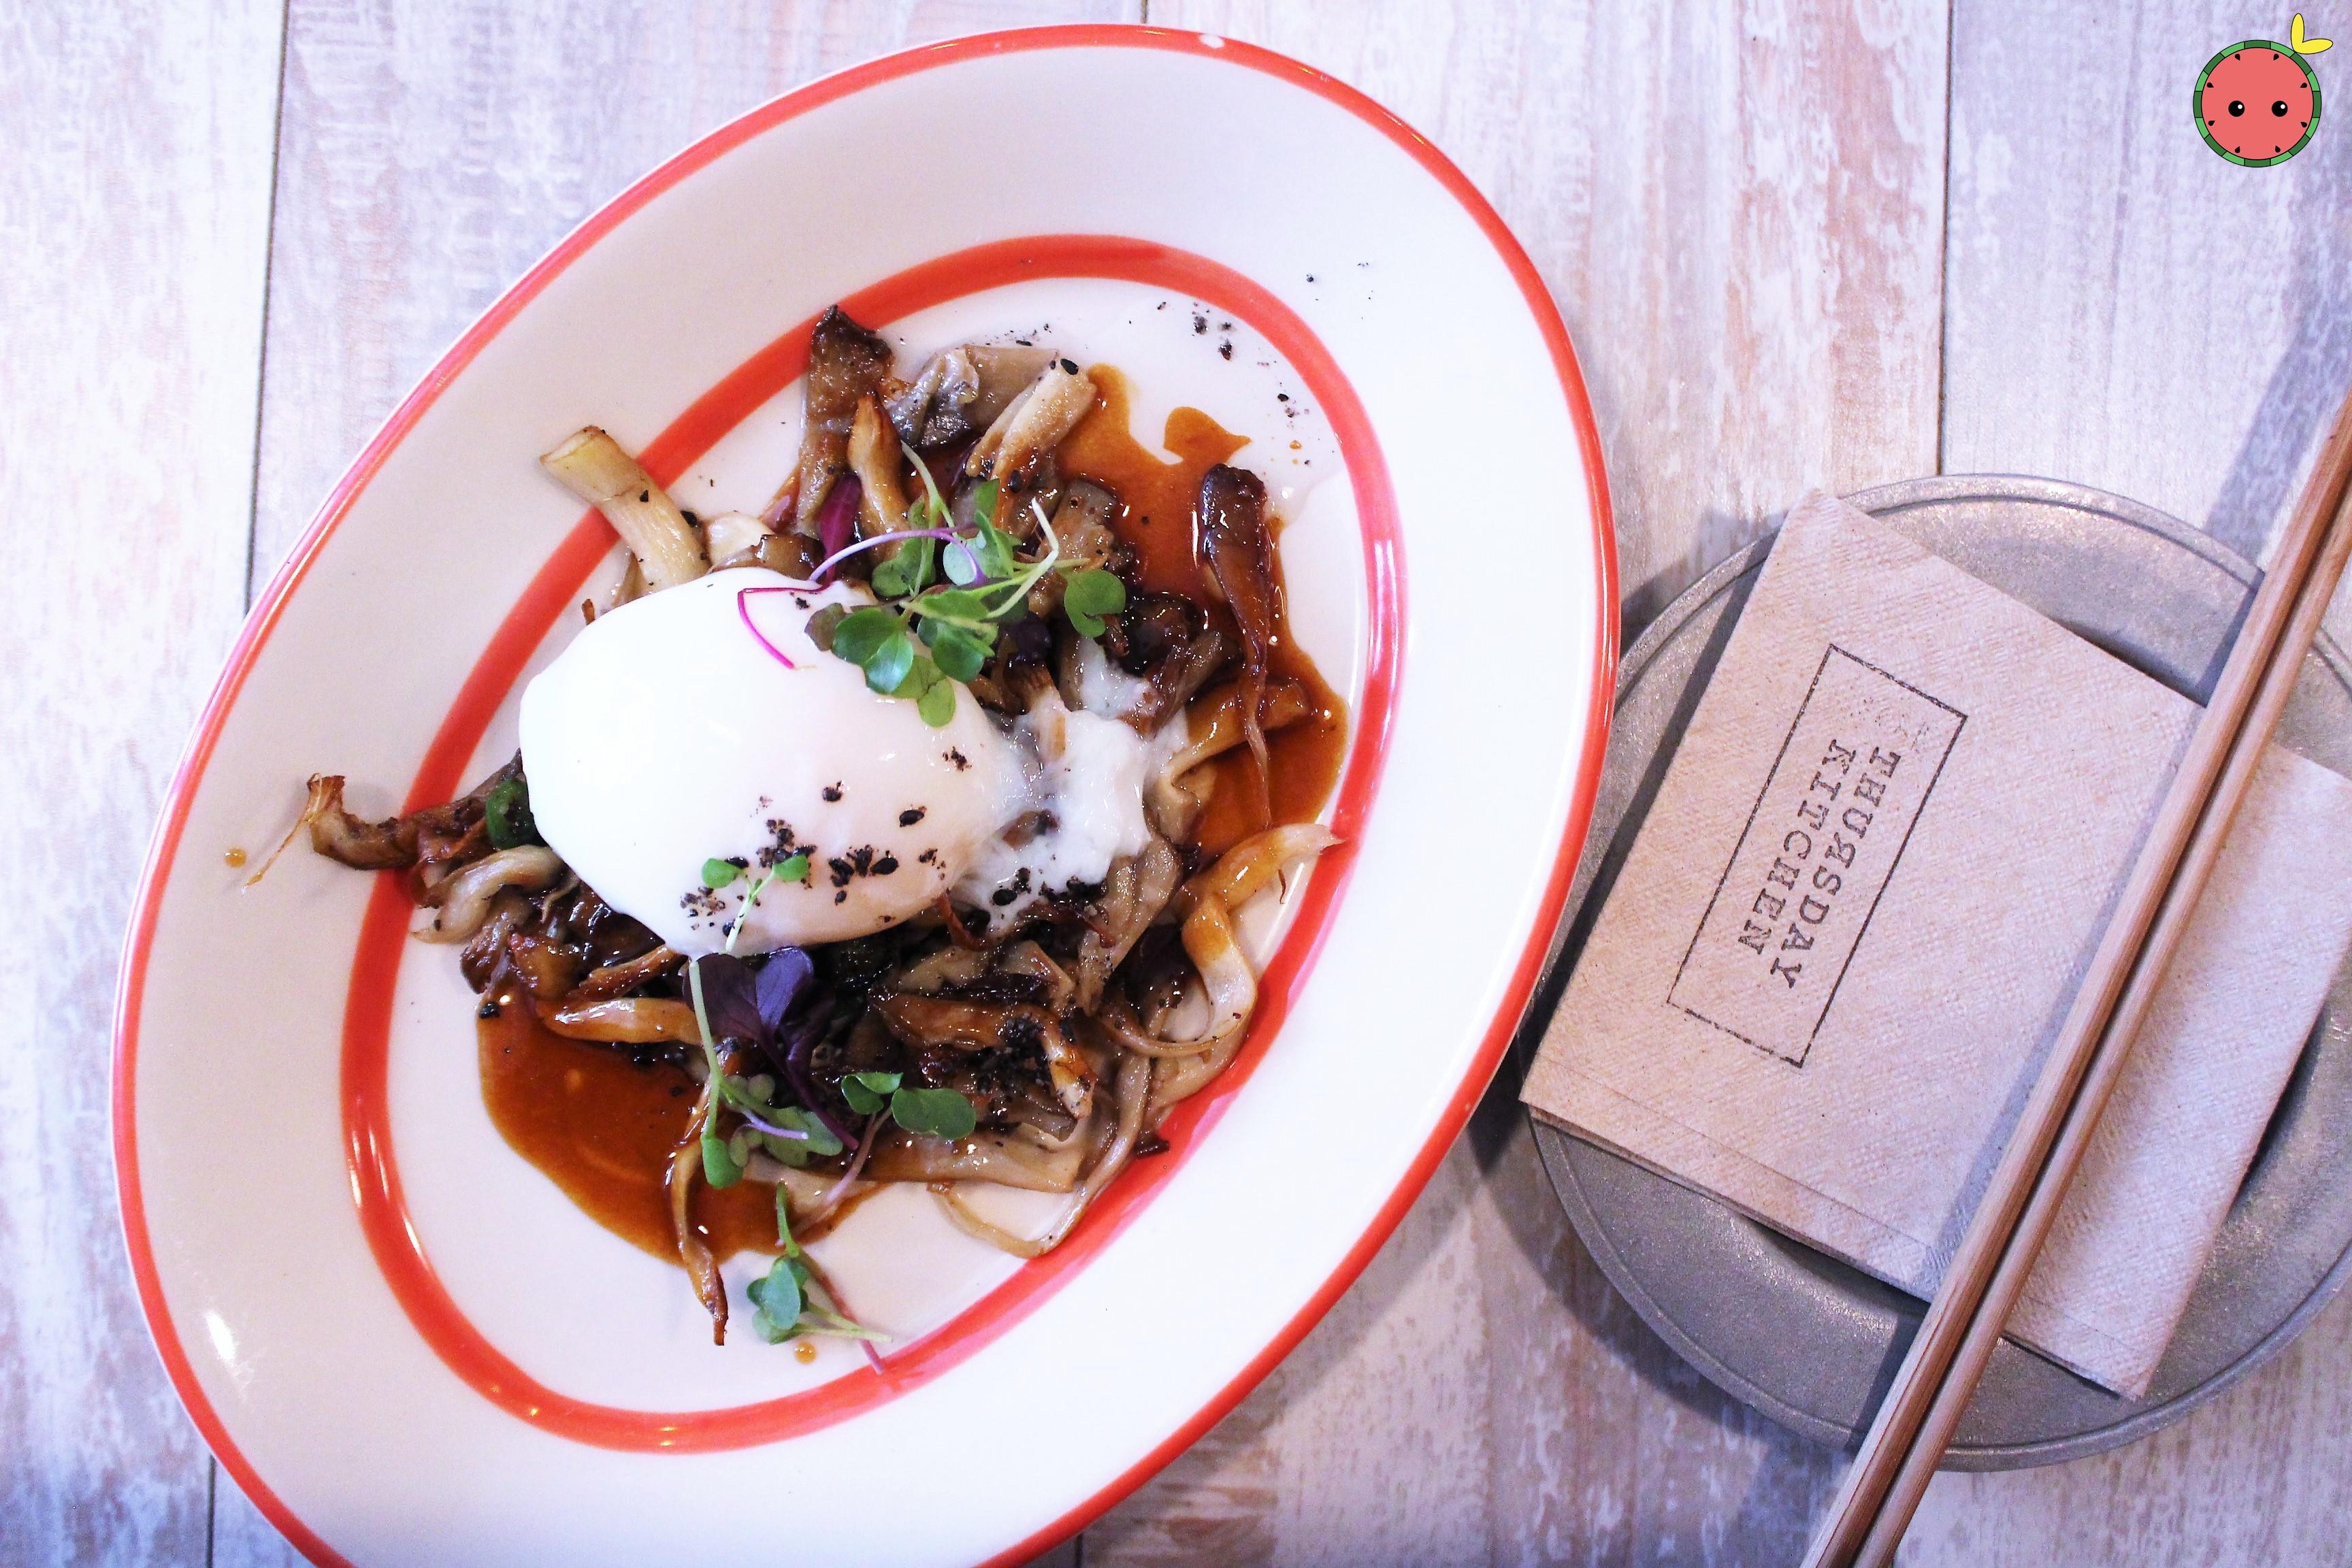 Mushroom_-_Sautéed_oyster_mushroom_with_poached_egg_and_truffle_infused_kabayaki_sauce